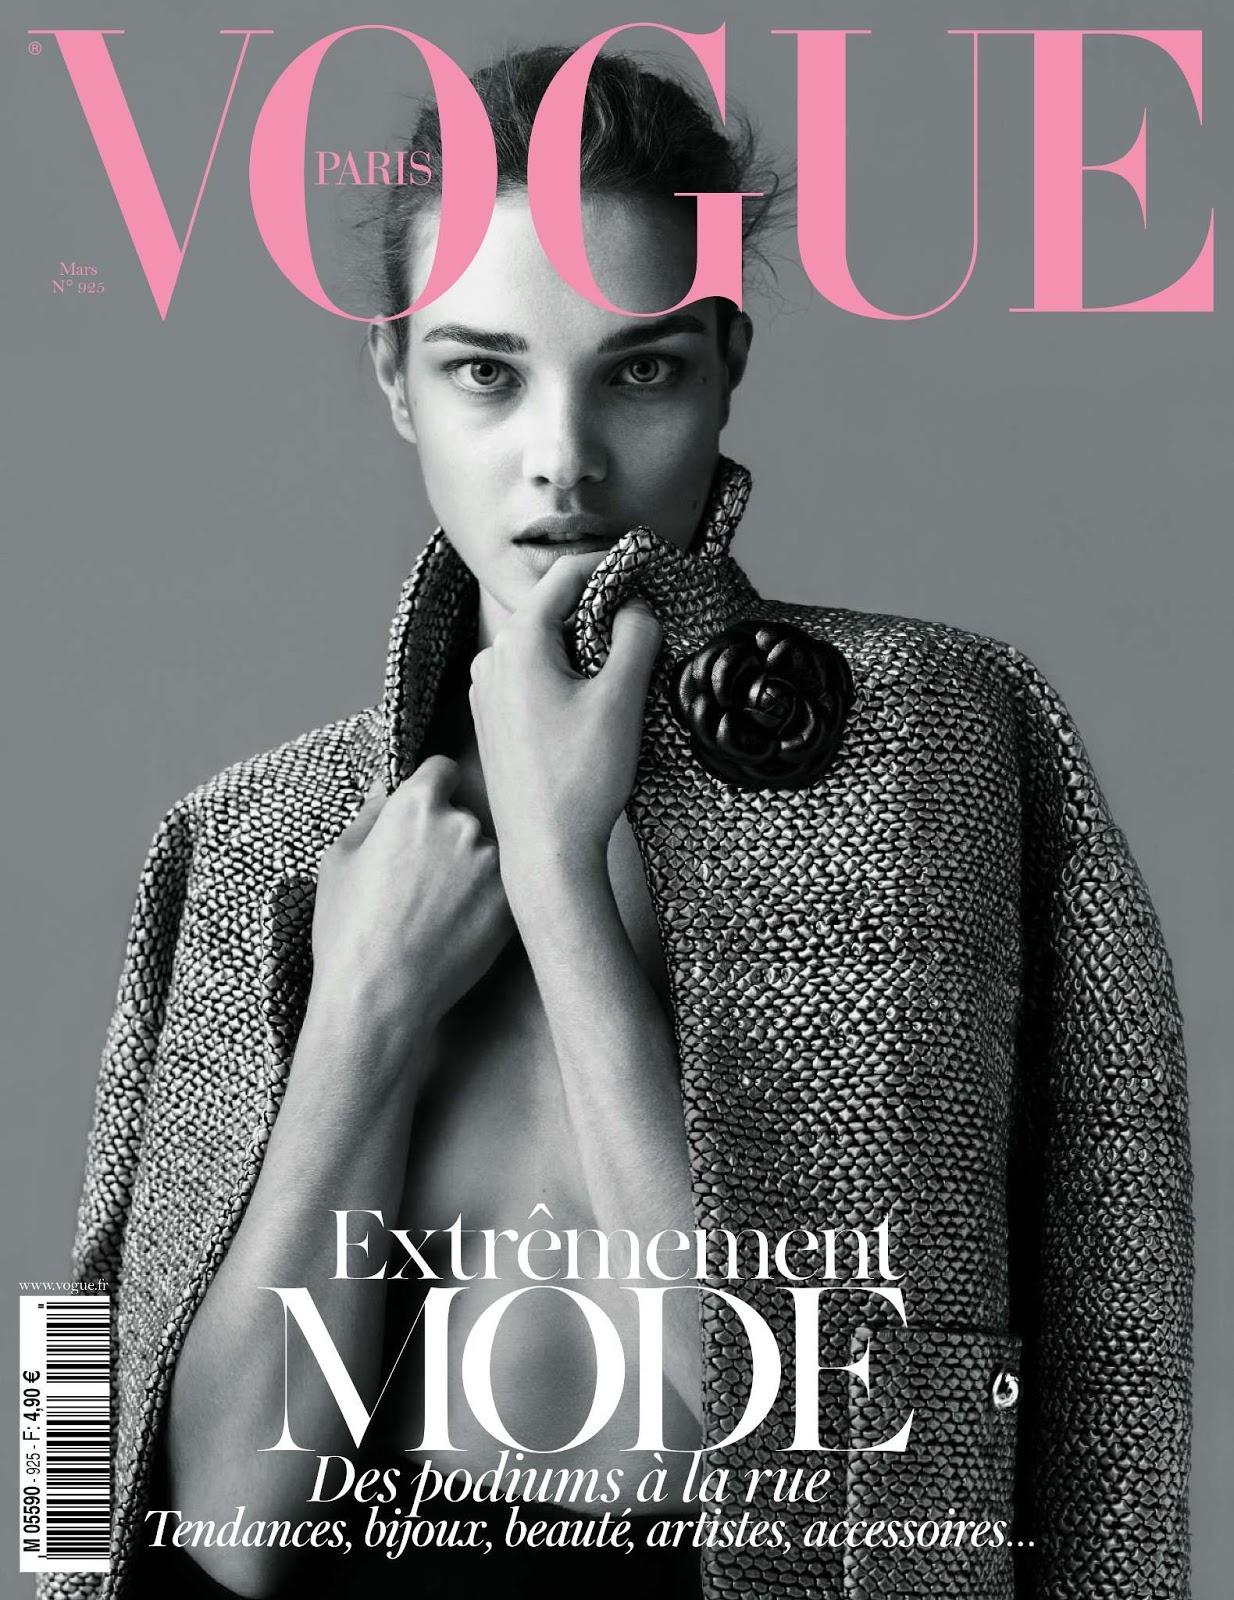 Vogue Magazine Uk May 2015 Issue: Vogue's Covers: Natalia Vodianova